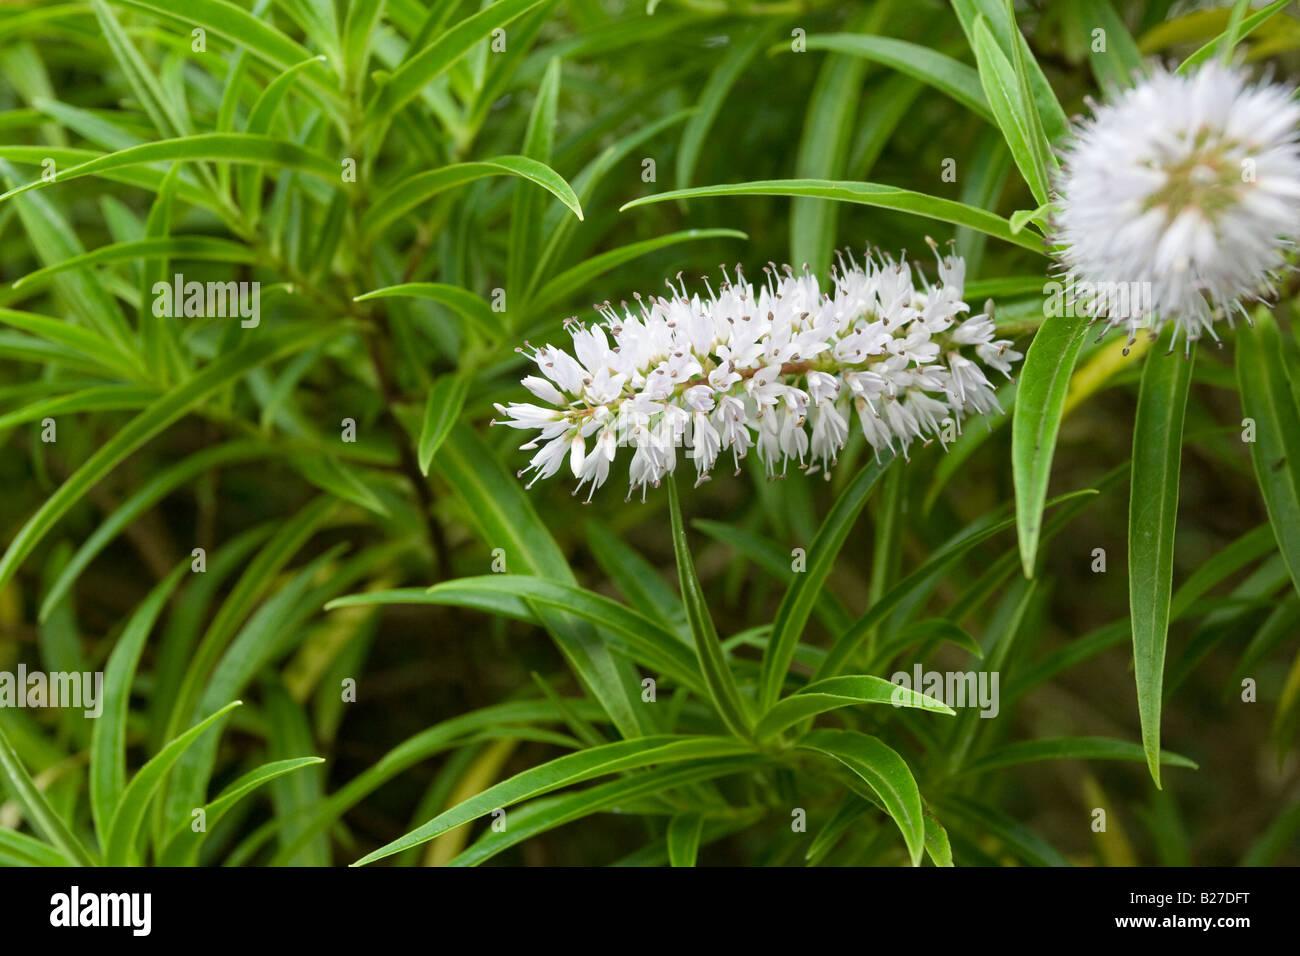 White spiky flowers against a grass background stock photo 18603980 white spiky flowers against a grass background mightylinksfo